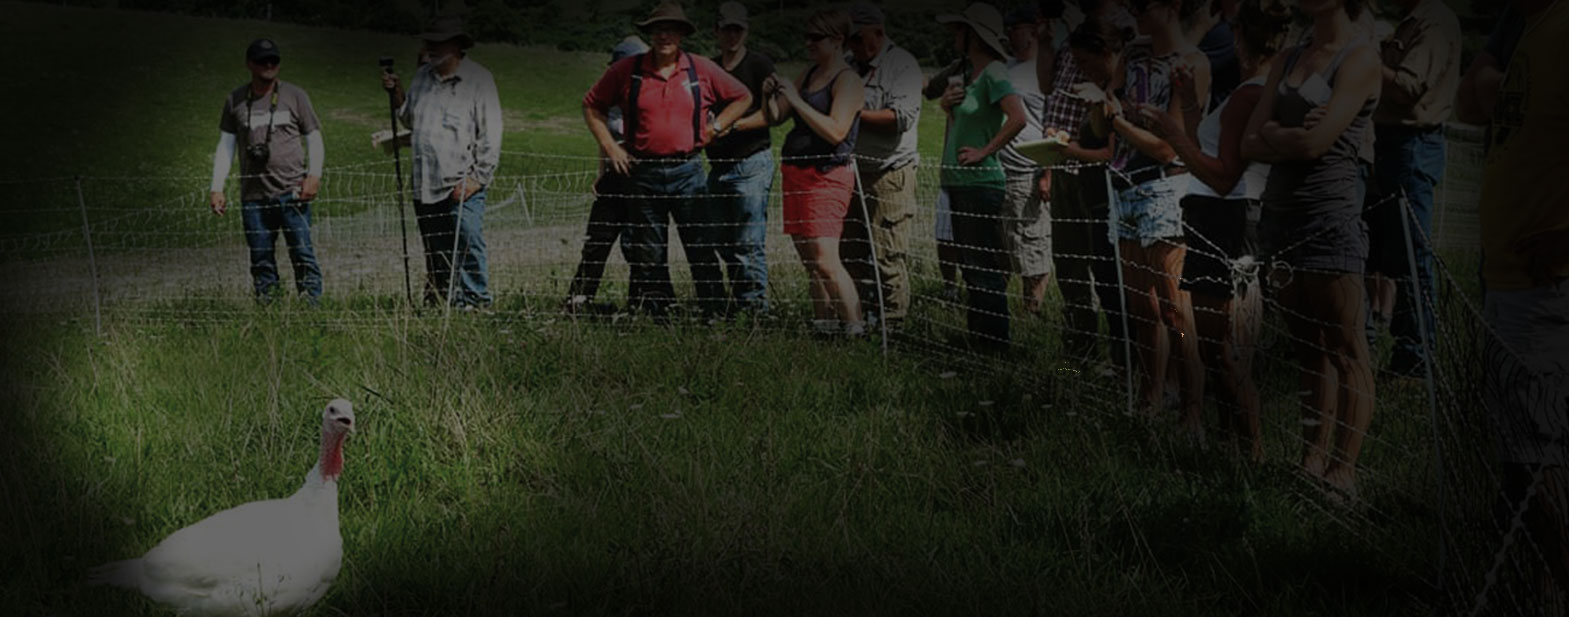 Polyface Farm Tour Q&A Webinar with Joel Salatin   MOTHER EARTH NEWS